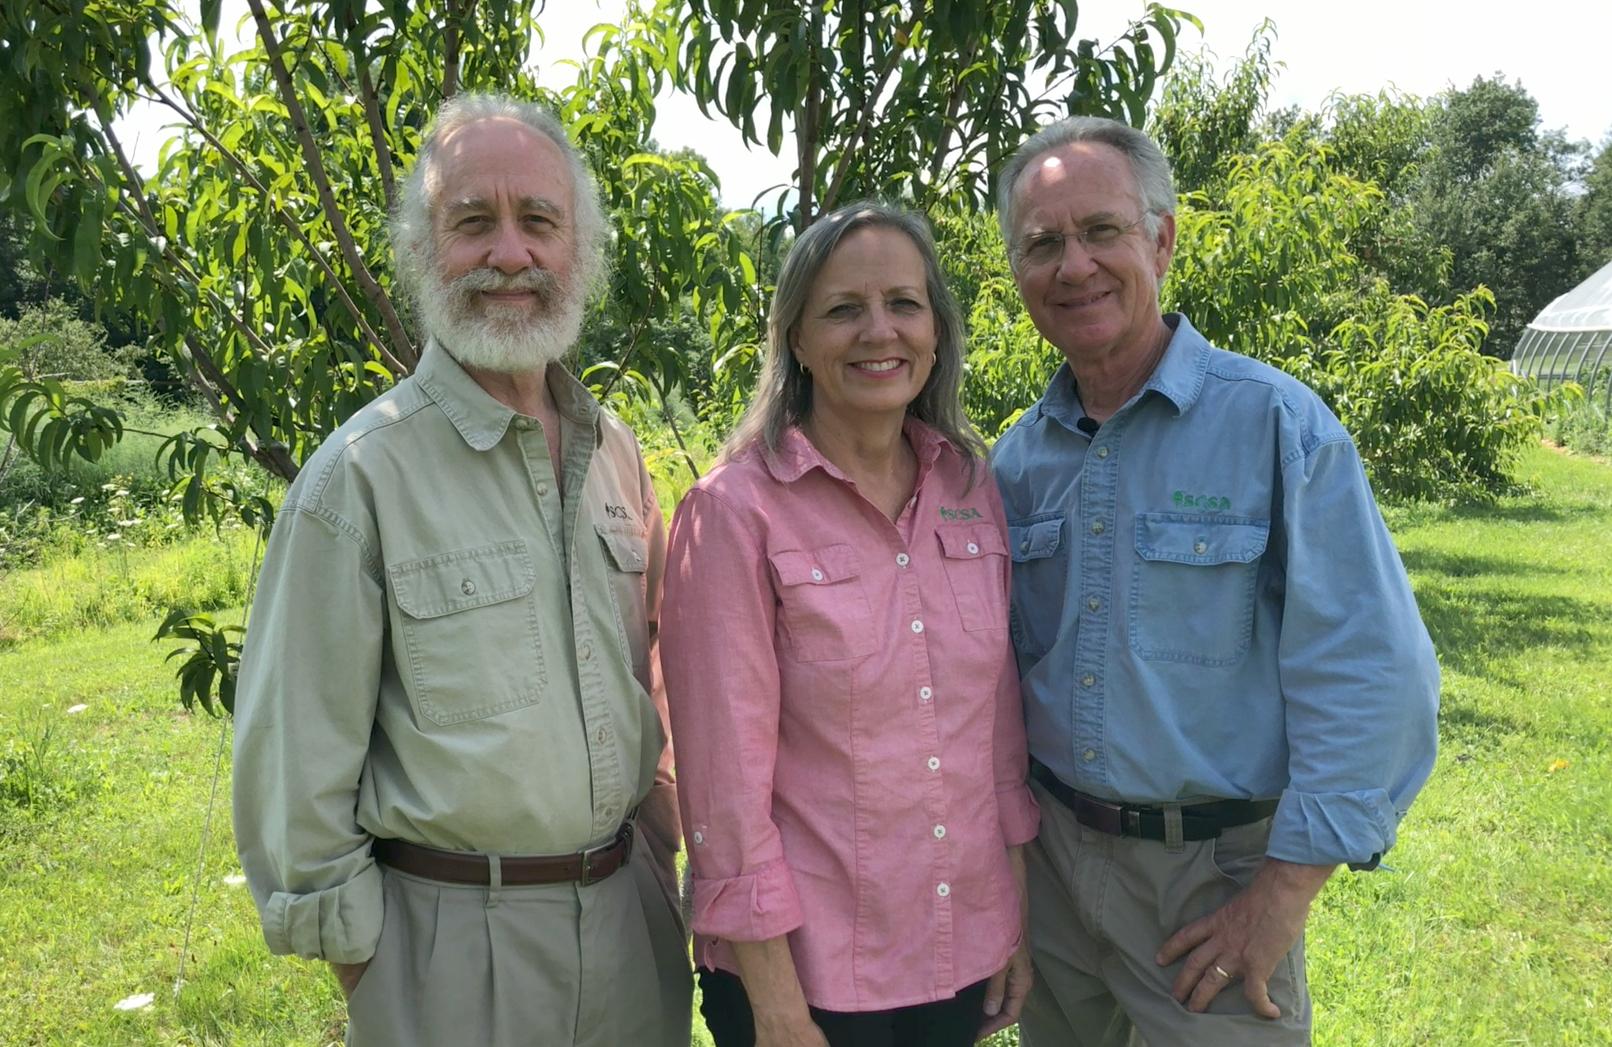 Rich, Carol, and Steve.